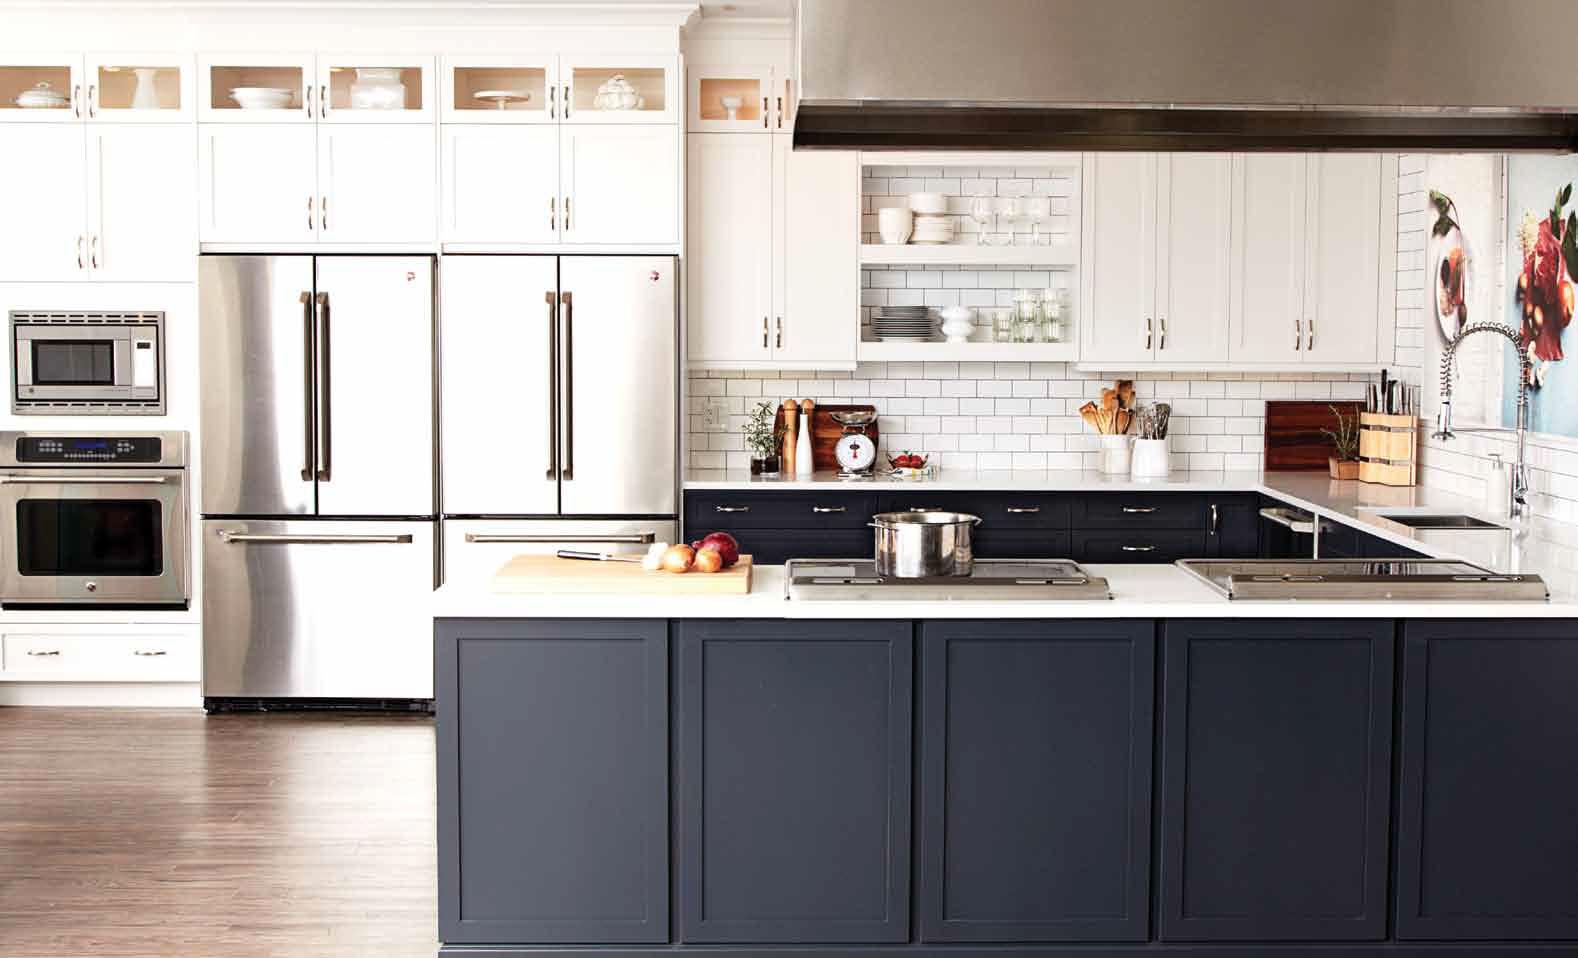 25 Beautiful Black And White Kitchens